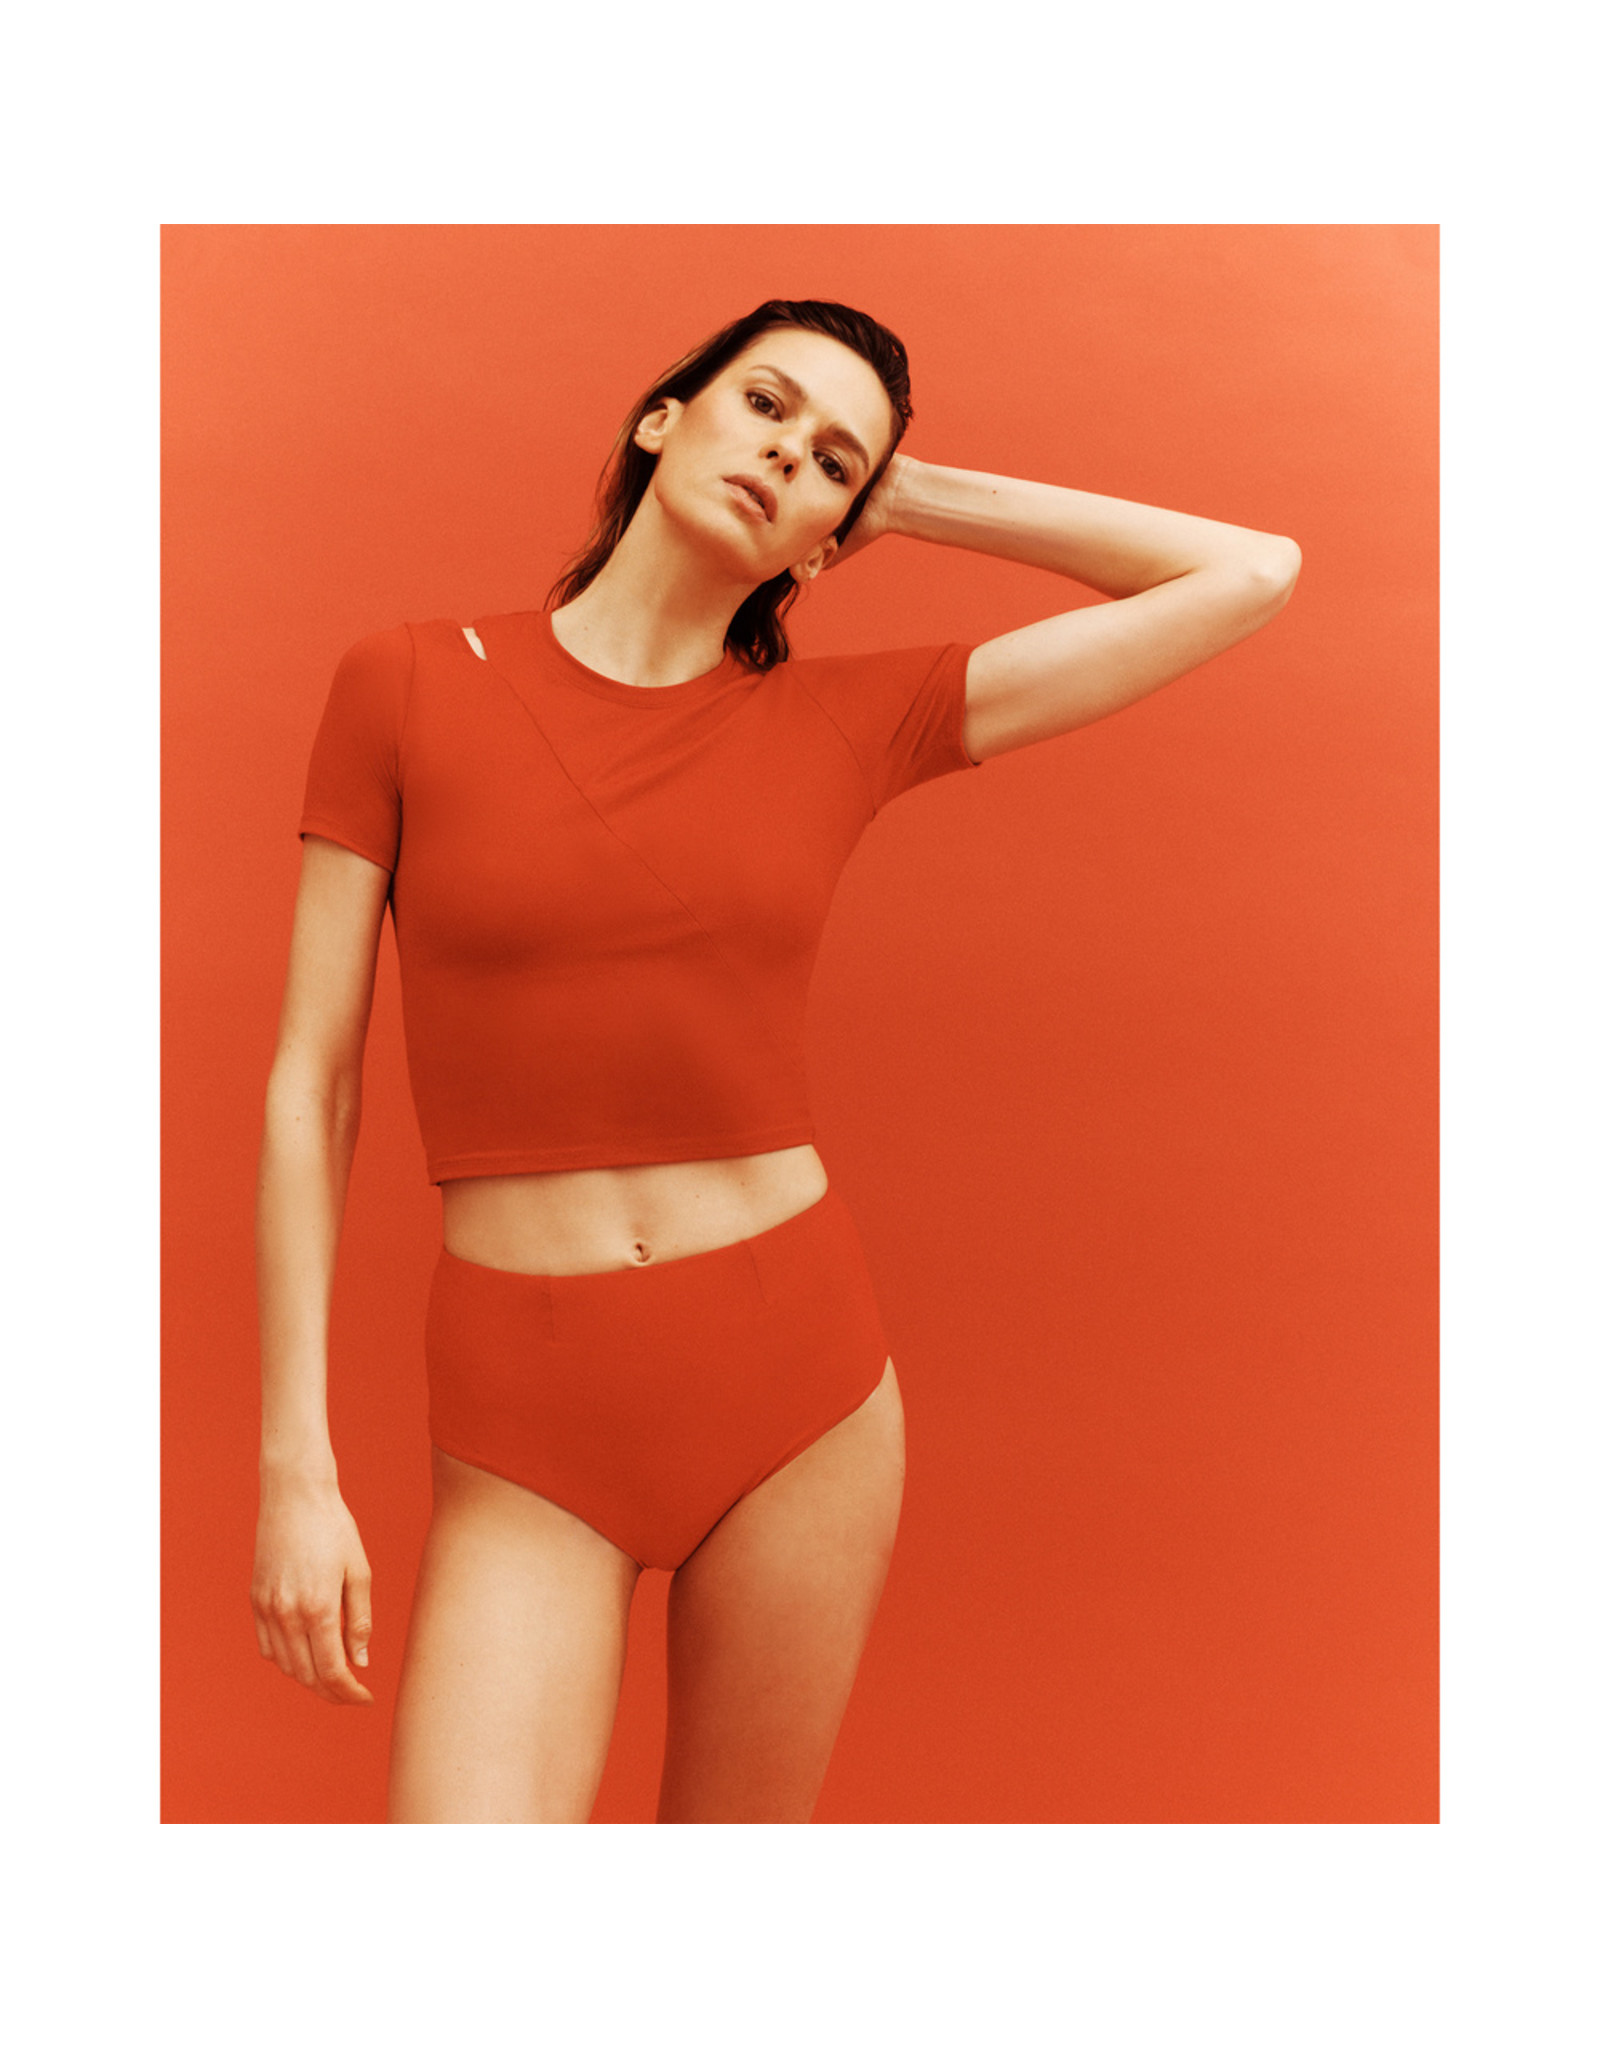 G. Sport x Proenza Schouler G. Sport x Proenza Schouler Short-Sleeve Cutout Top (Color: Red, Size: XS)